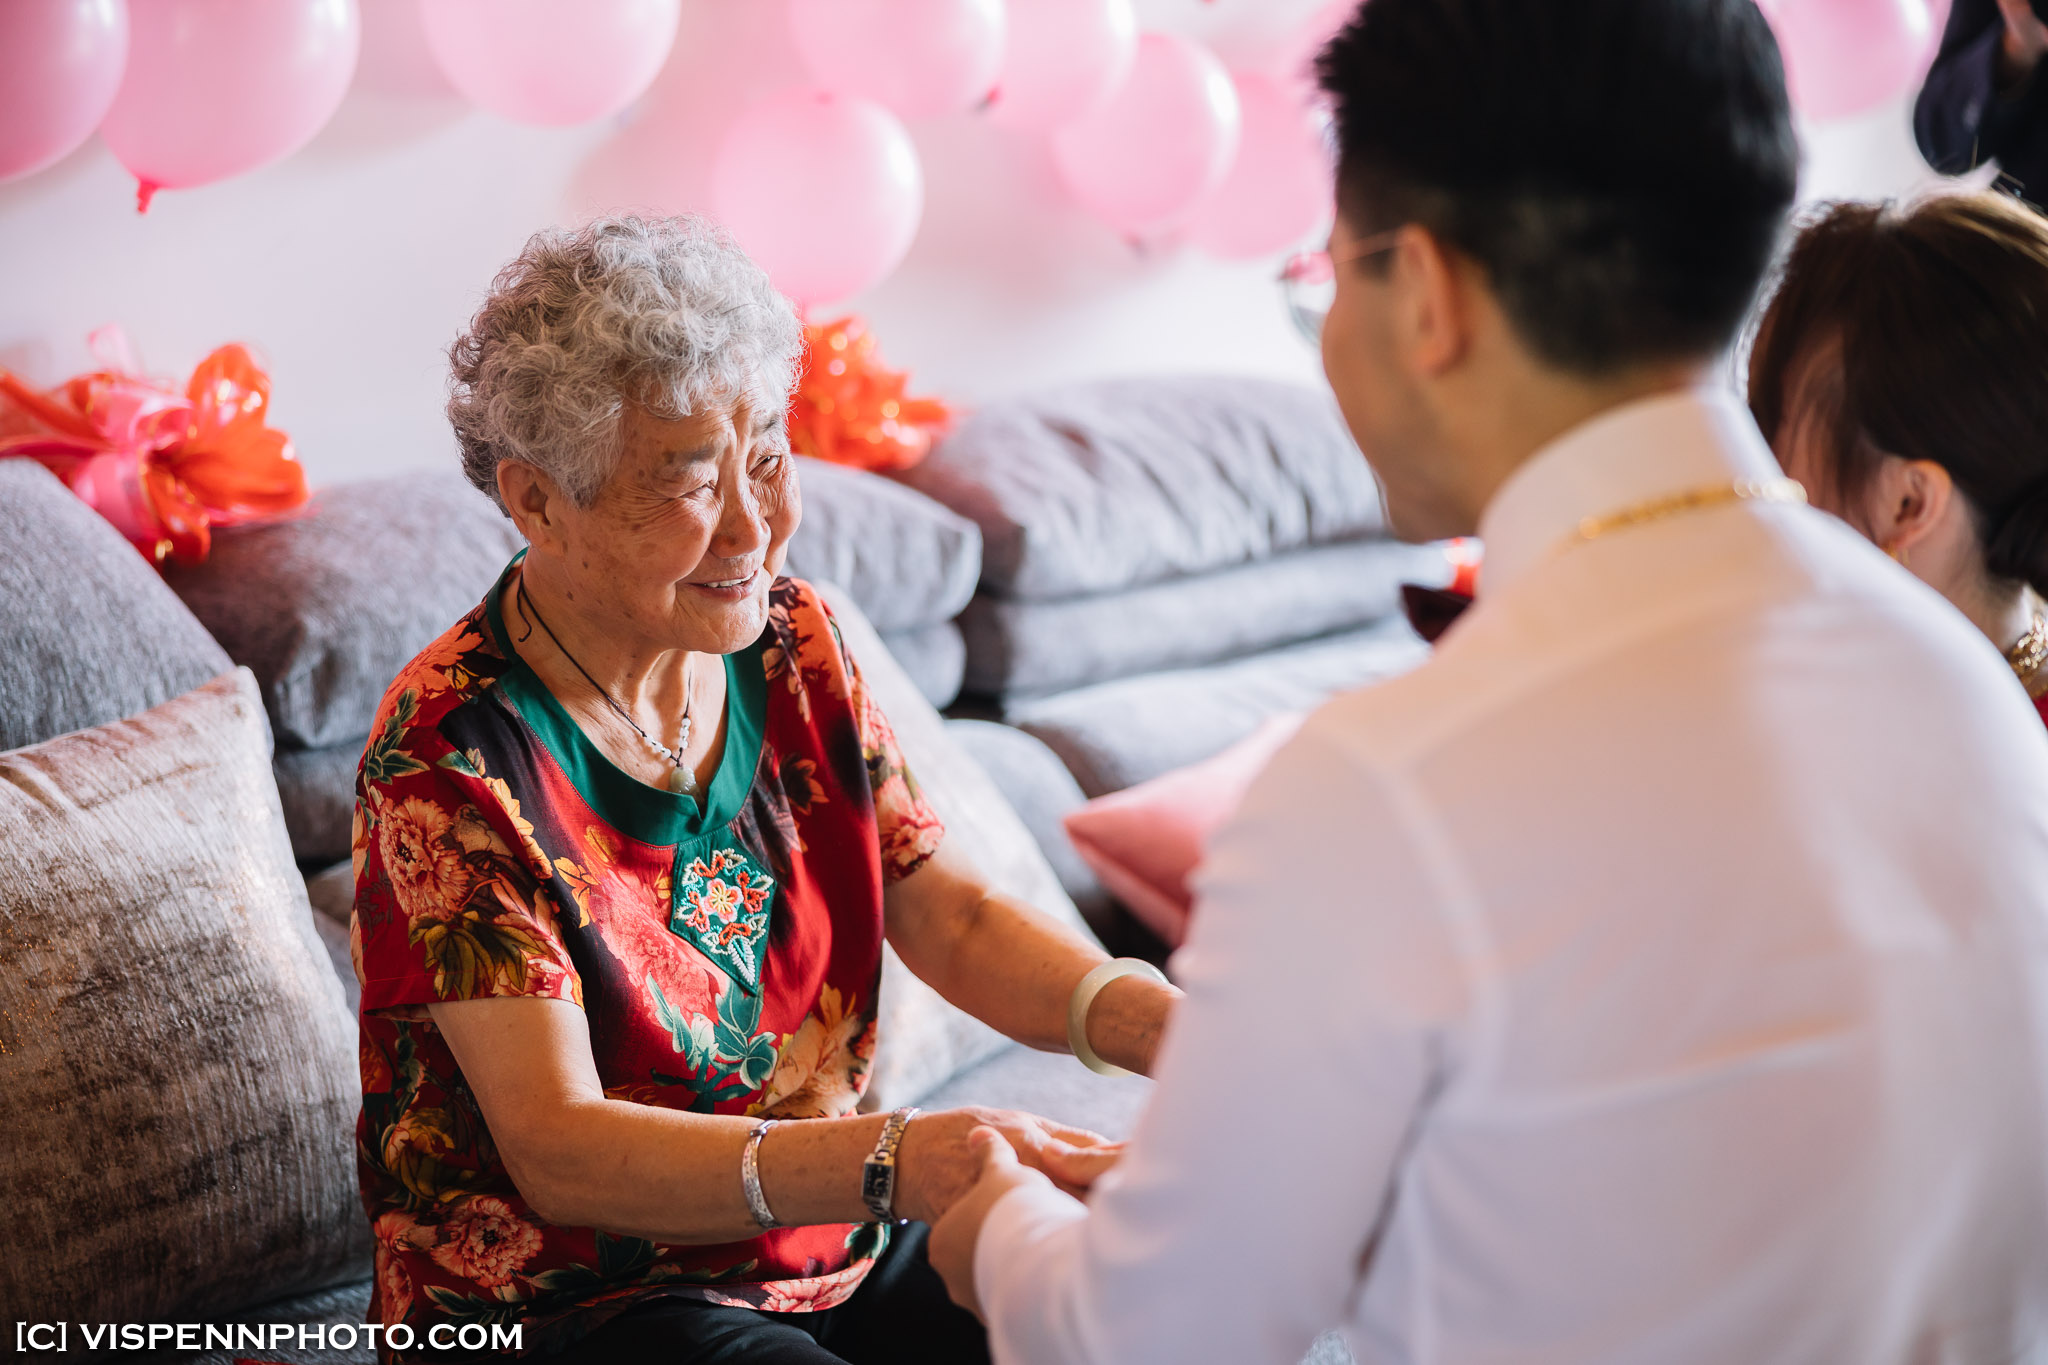 WEDDING DAY Photography Melbourne ElitaPB 03195 1P EOSR ZHPENN